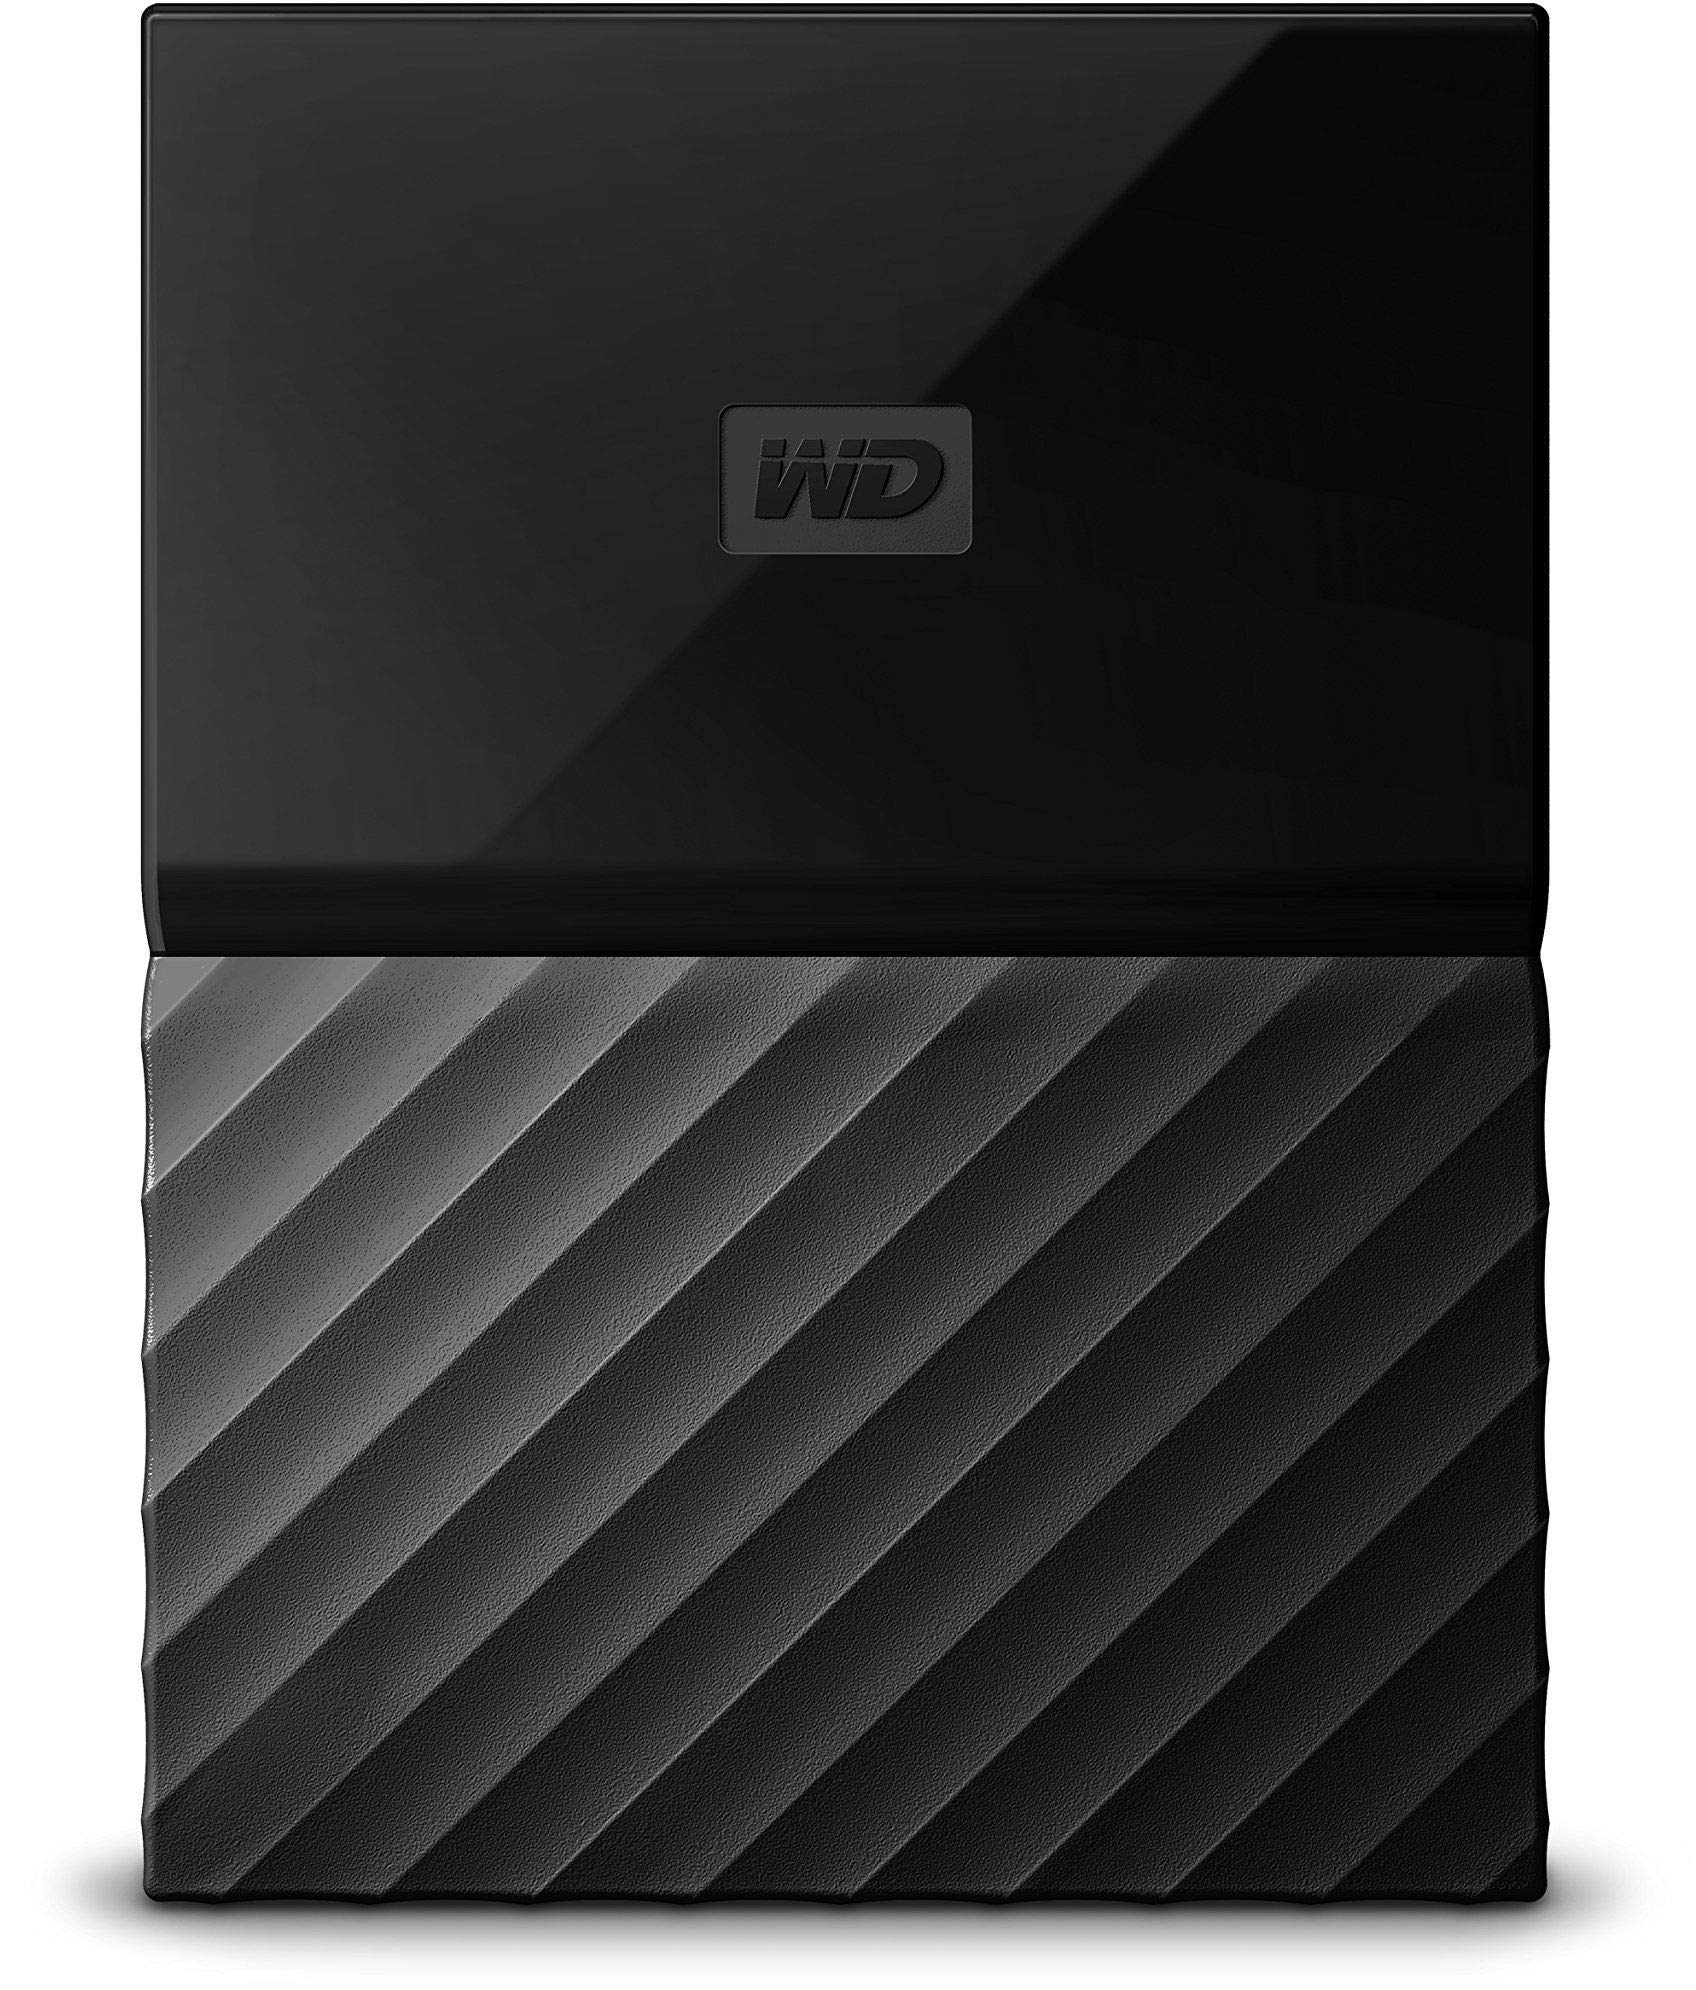 WD 2TB Black My Passport Portable External Hard Drive - USB 3.0 - WDBS4B0020BBK-WESN by Western Digital